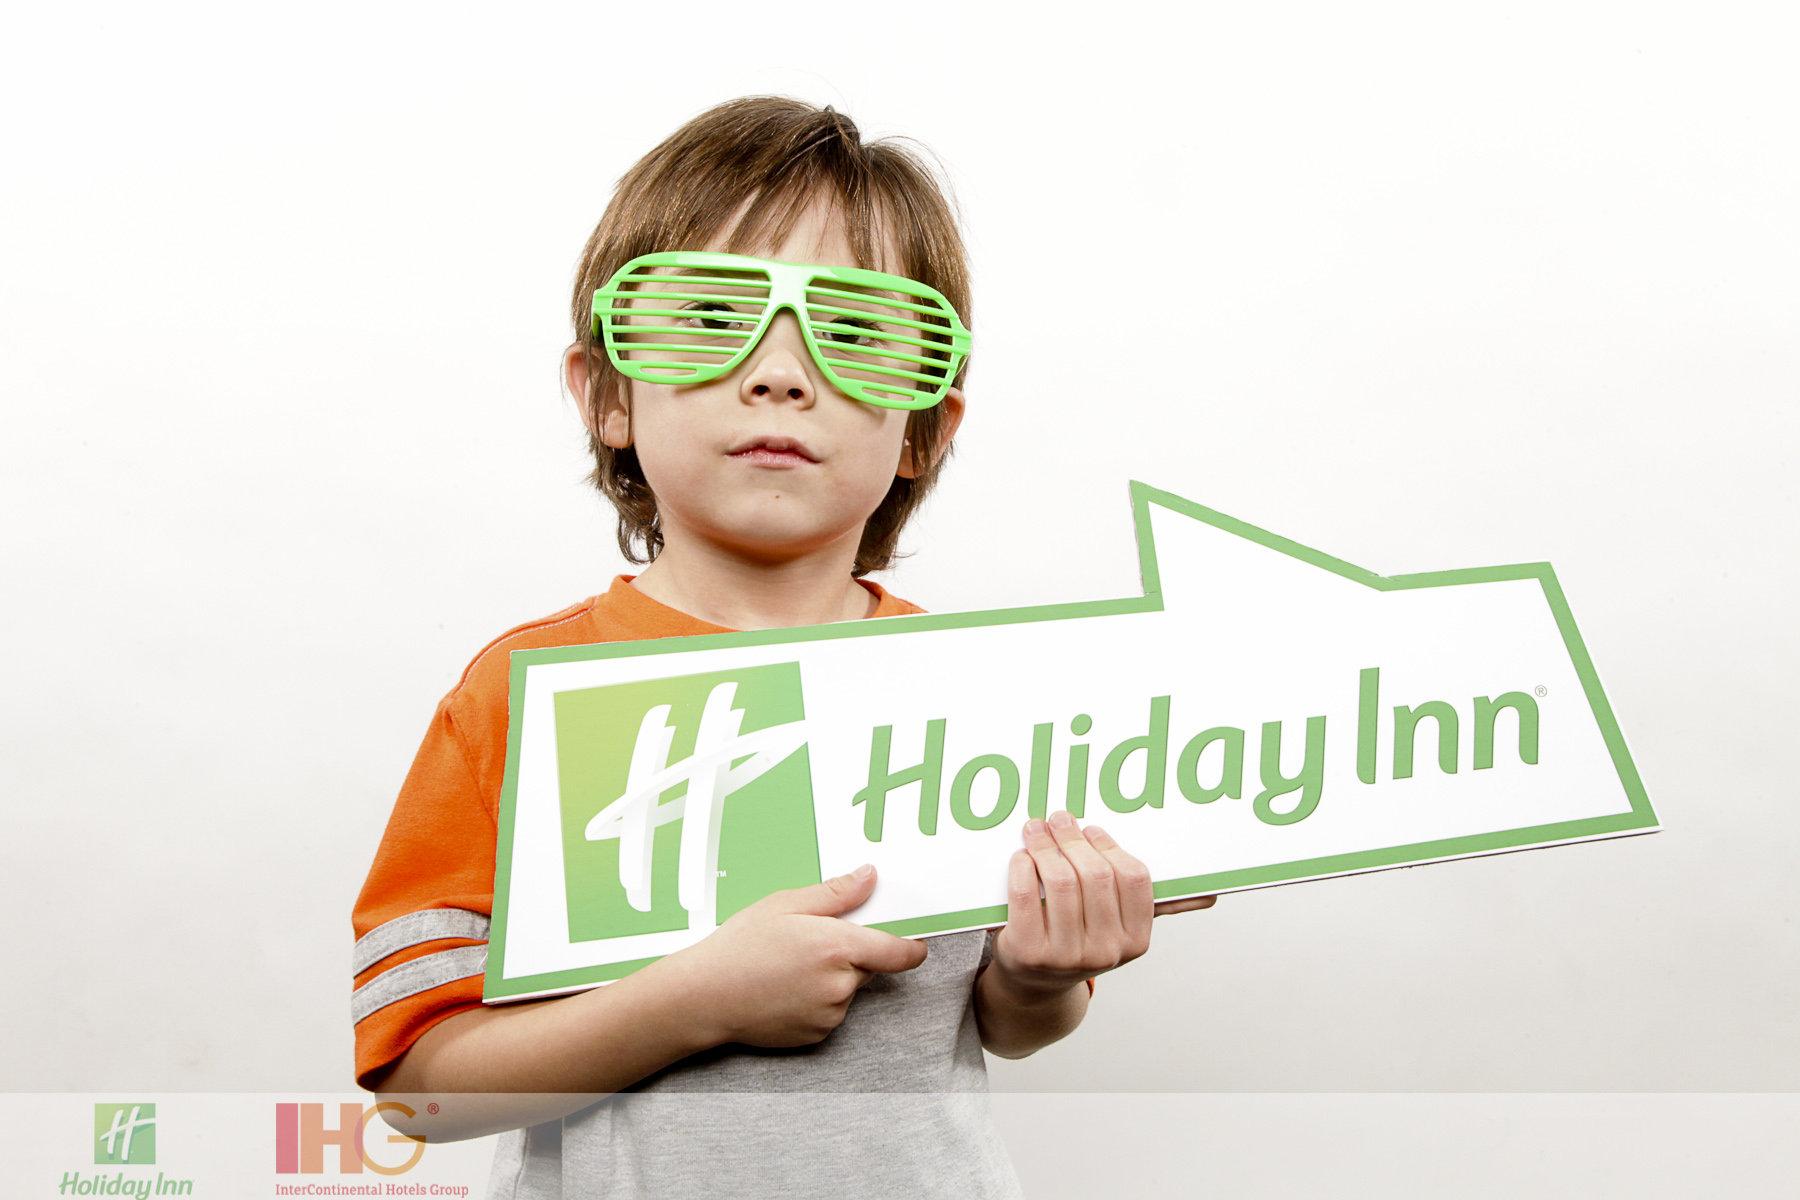 holiday inn-holiday inn-0031.jpg